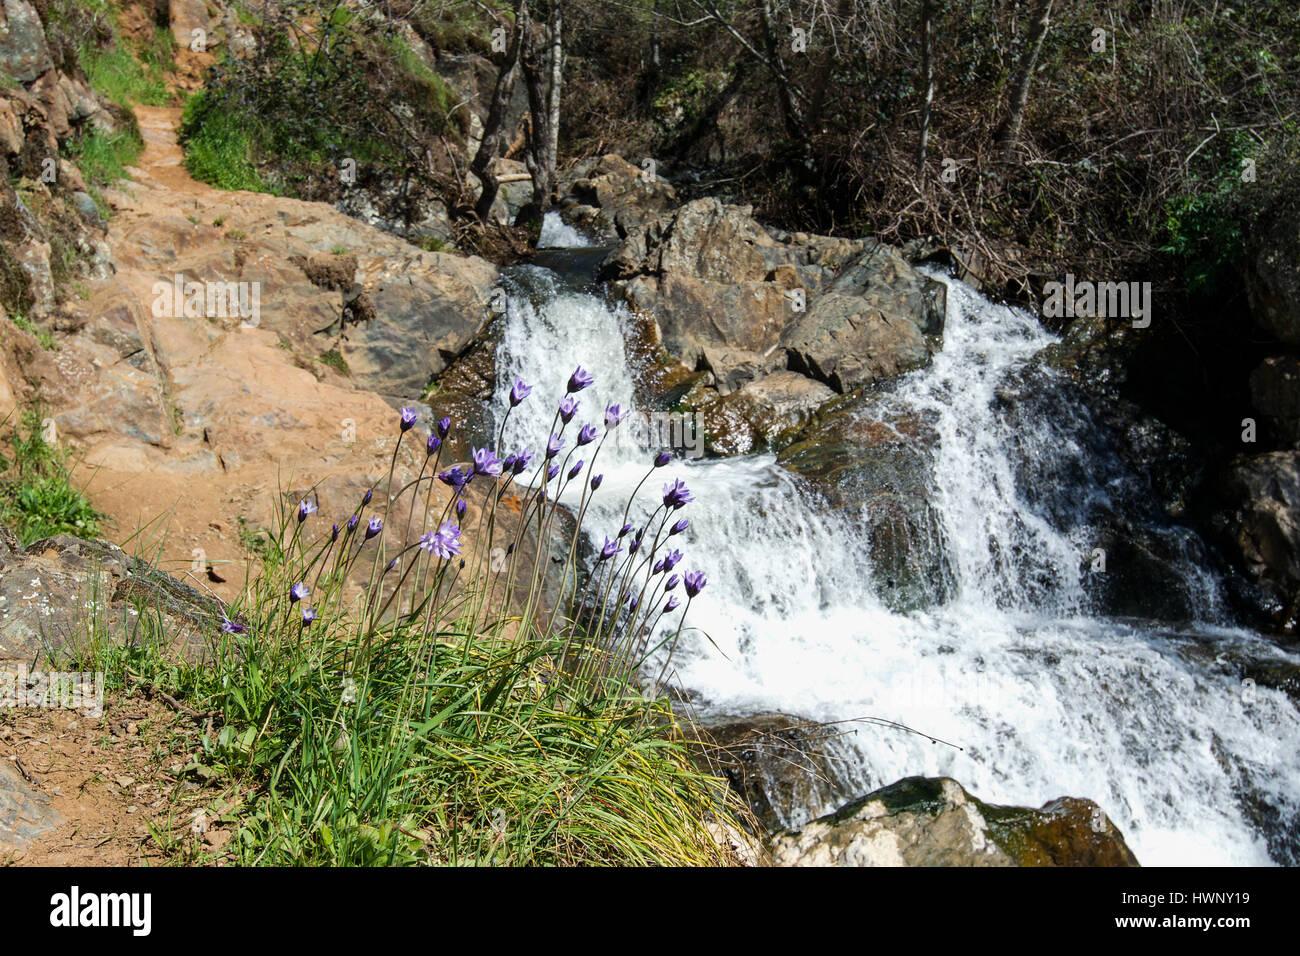 hidden falls hike auburn ca, hidden falls park auburn california, hidden falls adventure park trail map, on hidden falls trail map auburn ca